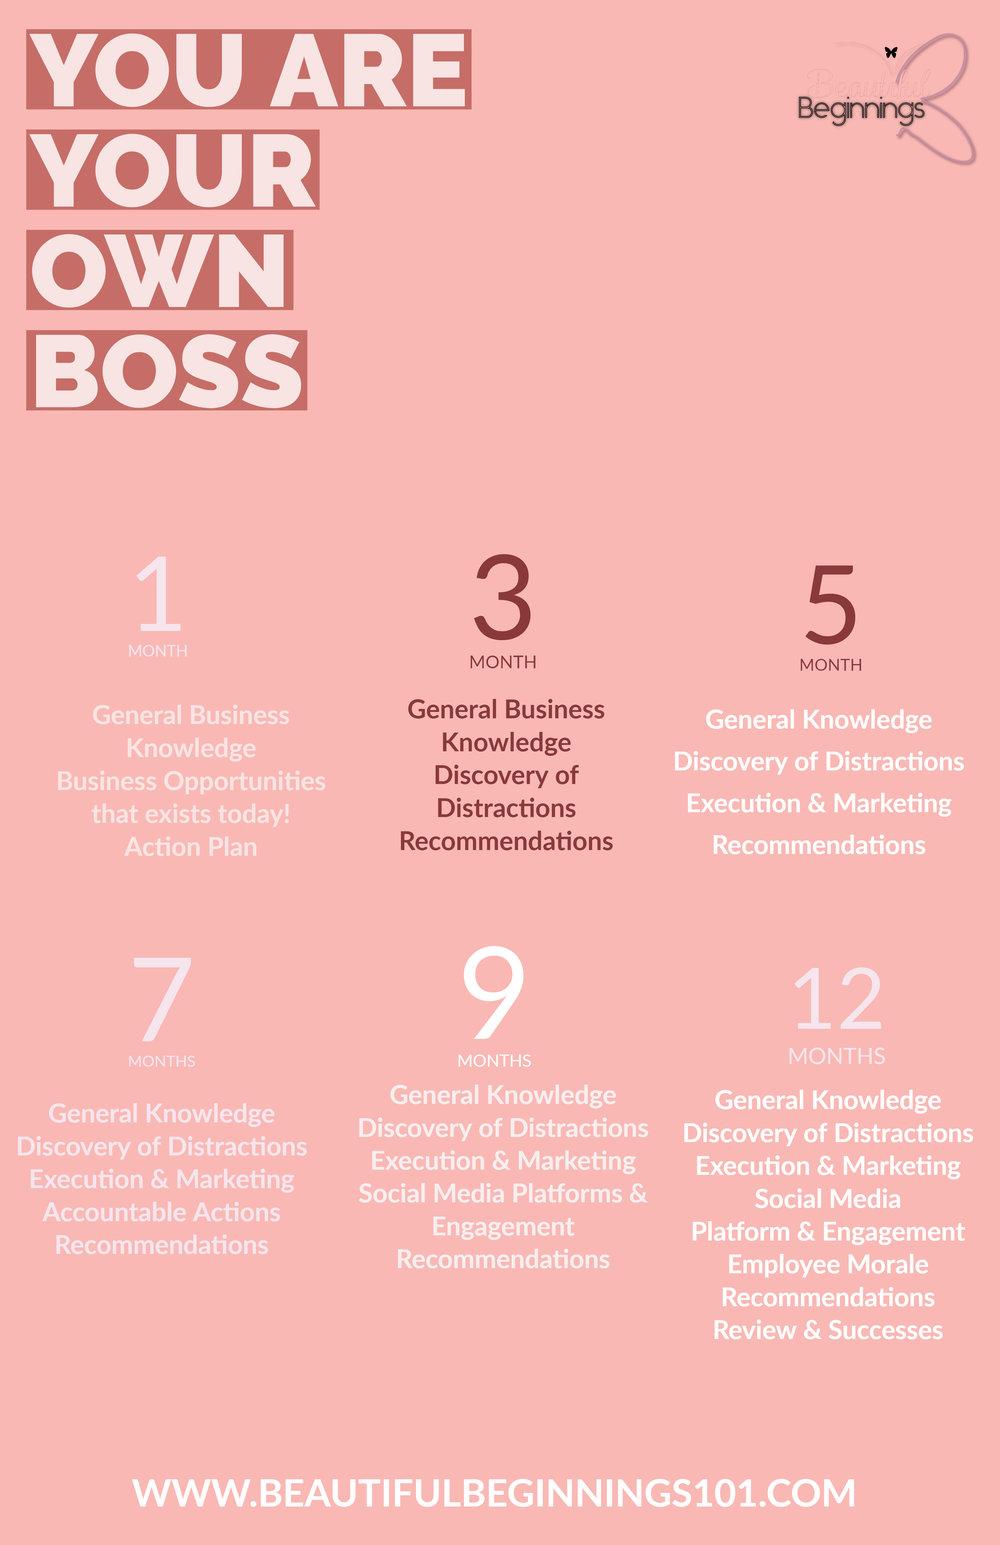 small business, entrepreneurship, coachrenee101, social media, marketing, advertising, project management